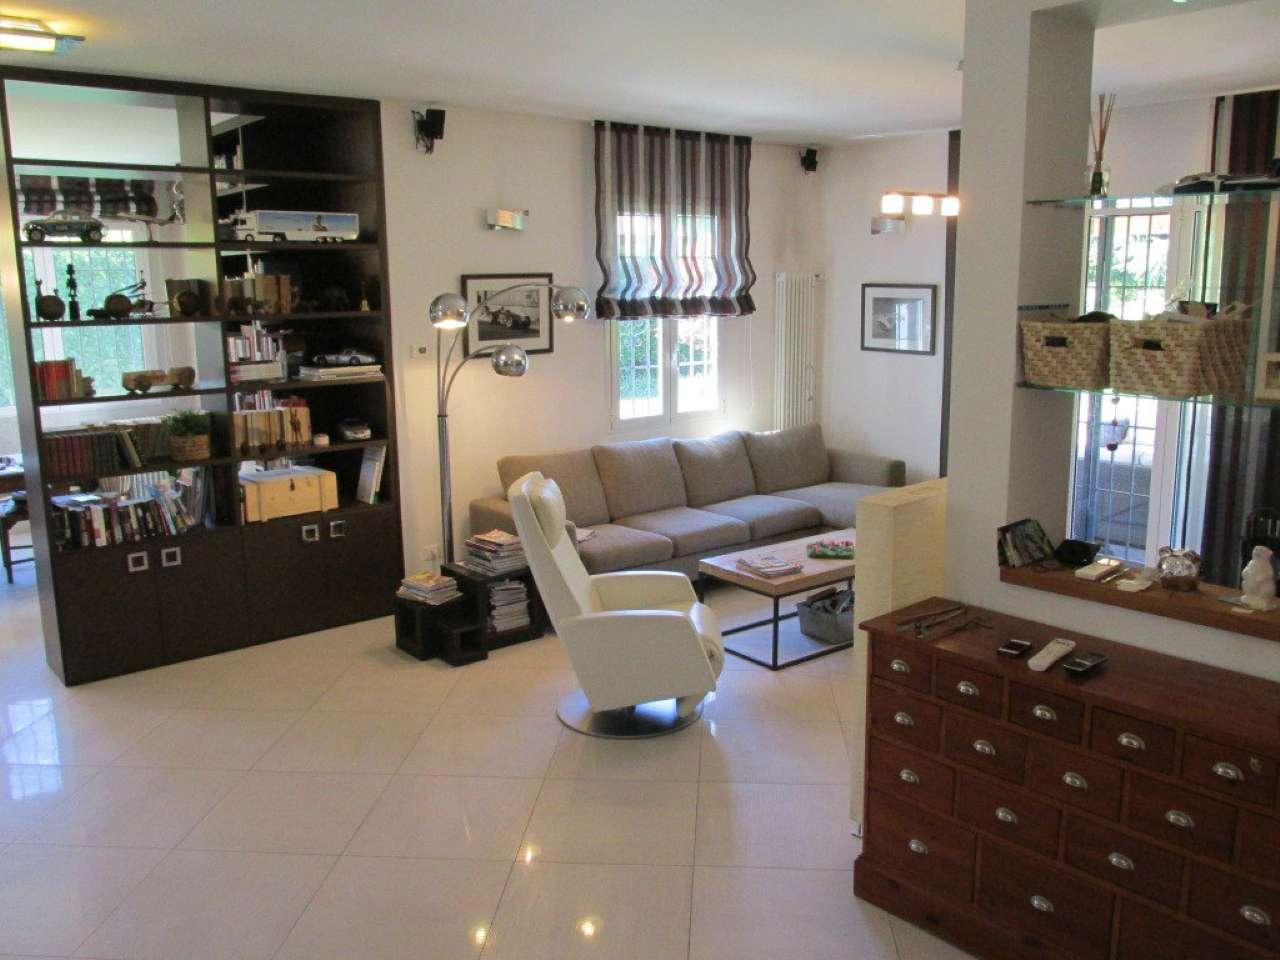 Villa in Vendita a Segrate: 5 locali, 300 mq - Foto 5